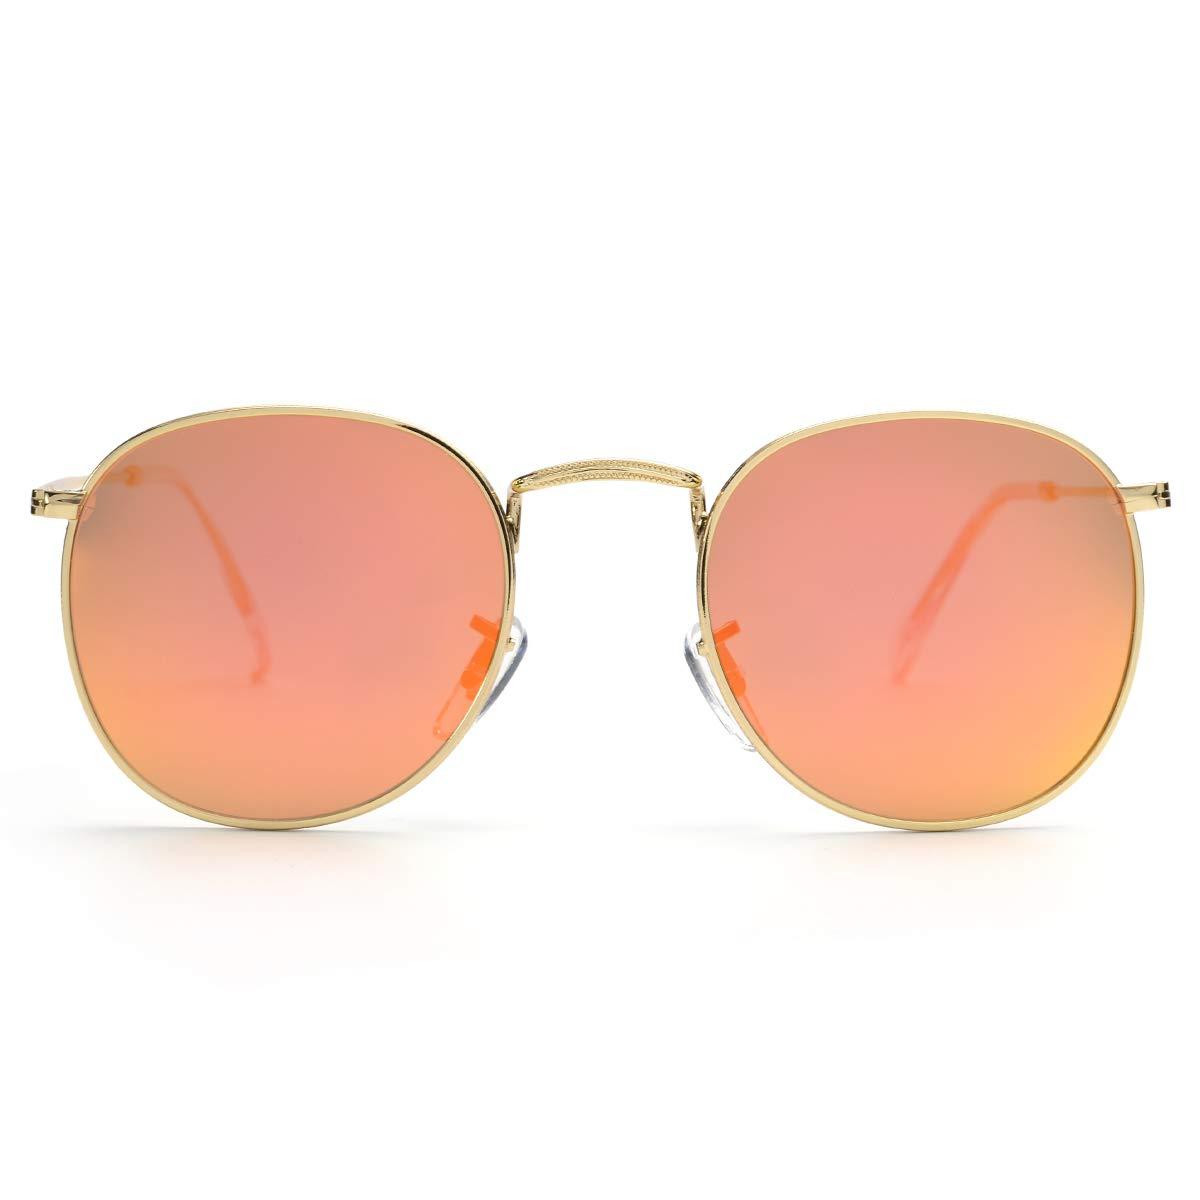 C1 gold Frame orange Revo Lens John Lennon Vintage Small Round Polarized Sunglasses Lightweight Metal Frame Mirrored Lens for Men and Women with CaseUV 400 Predection 50MM HP1003C4